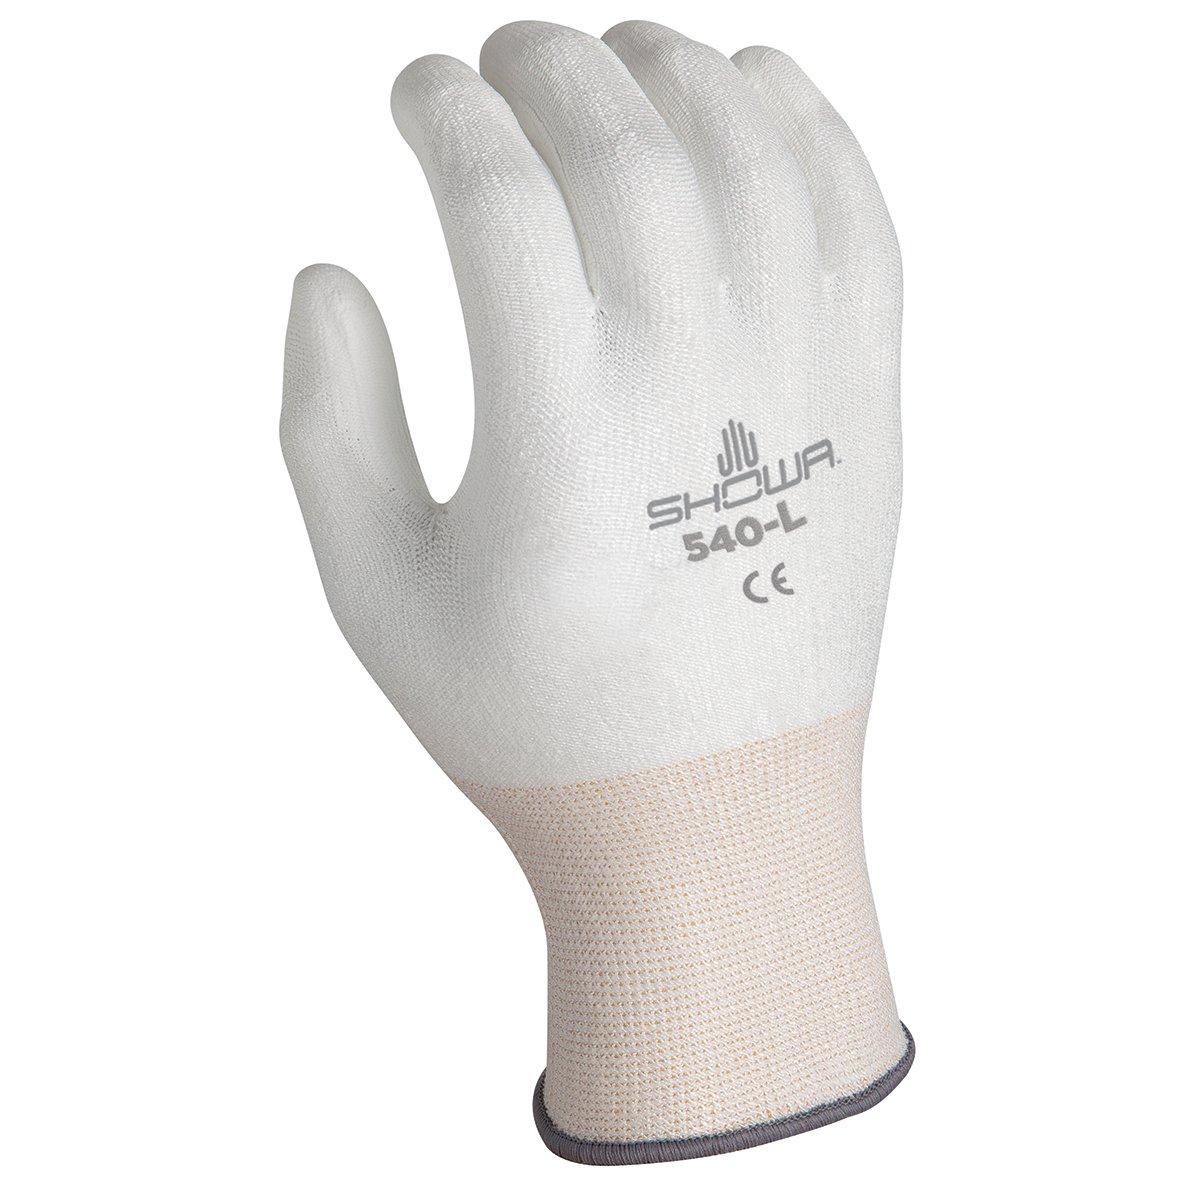 SHOWA 540 Polyurethane Palm Coating Glove, 13-Gauge Engineered HPPE Fiber Liner, Cut Resistant, Large  (Pack of 12 Pairs)